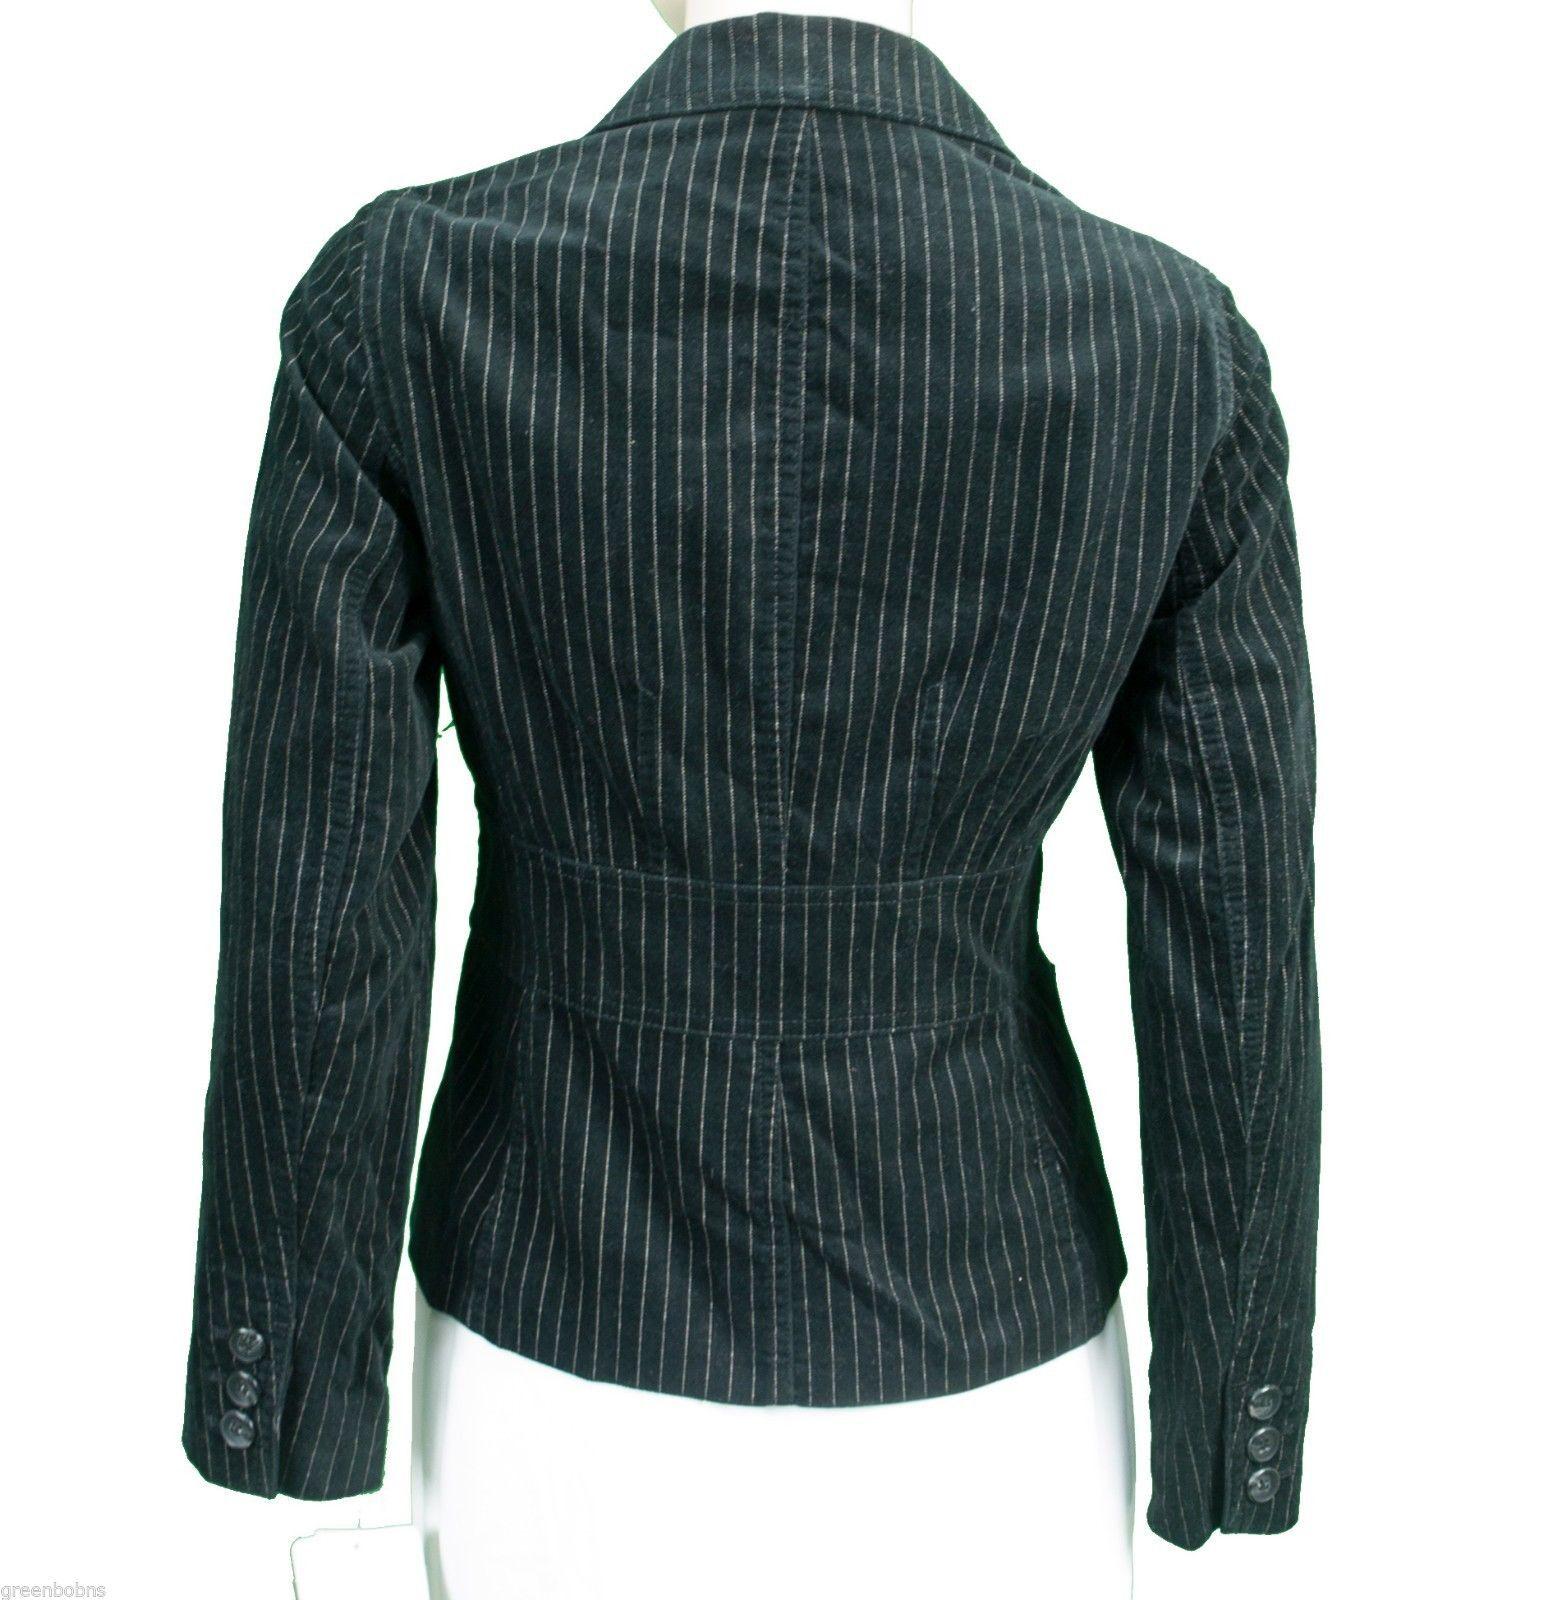 New! Jones New York Black Velvet Pinstripe Blazer Jacket M Pin Stripe zara h&m